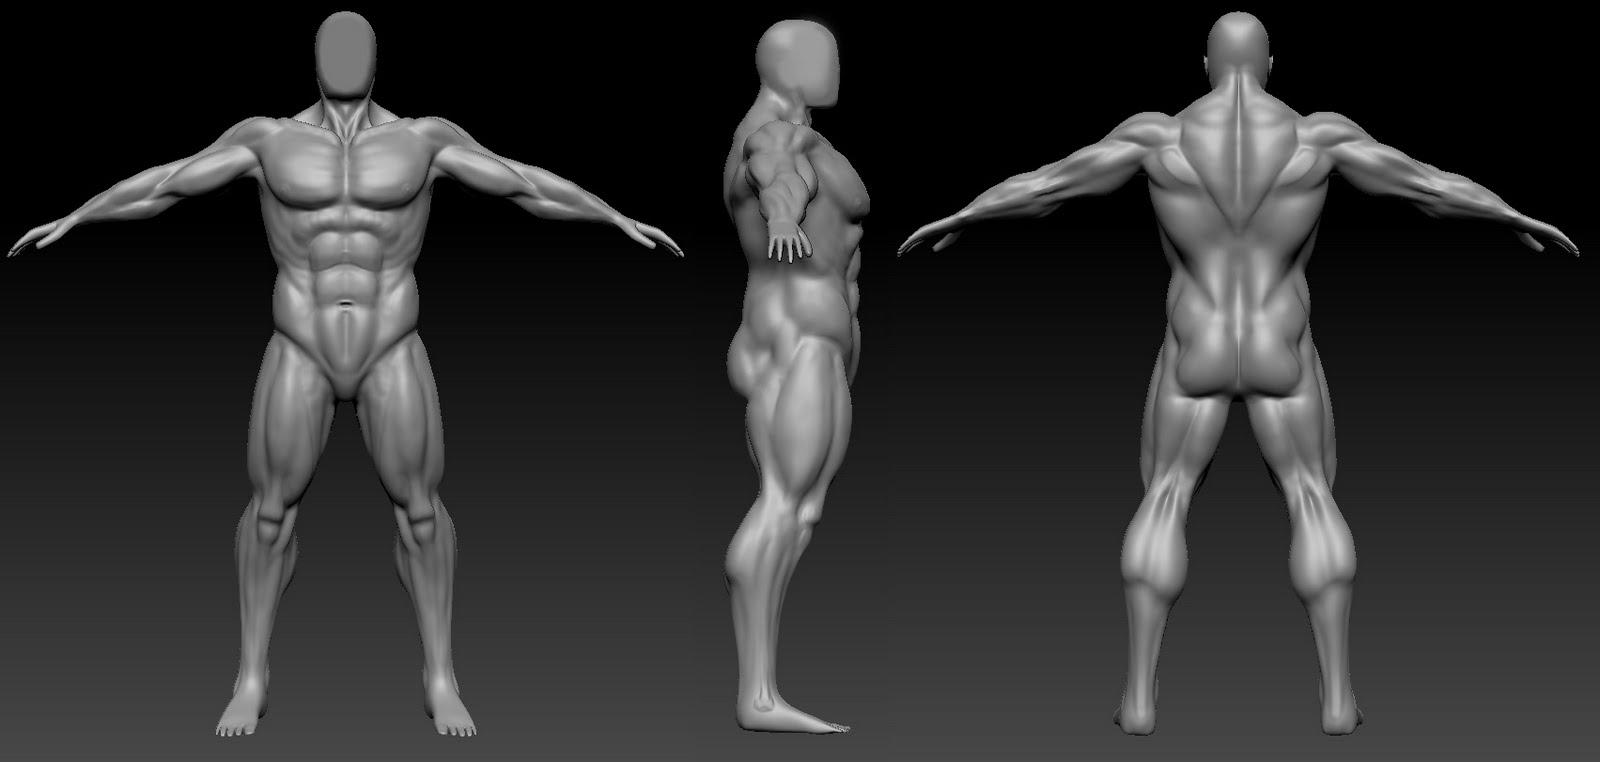 Pixels e Poligonos: ZBrush - estudo de anatomia masculina